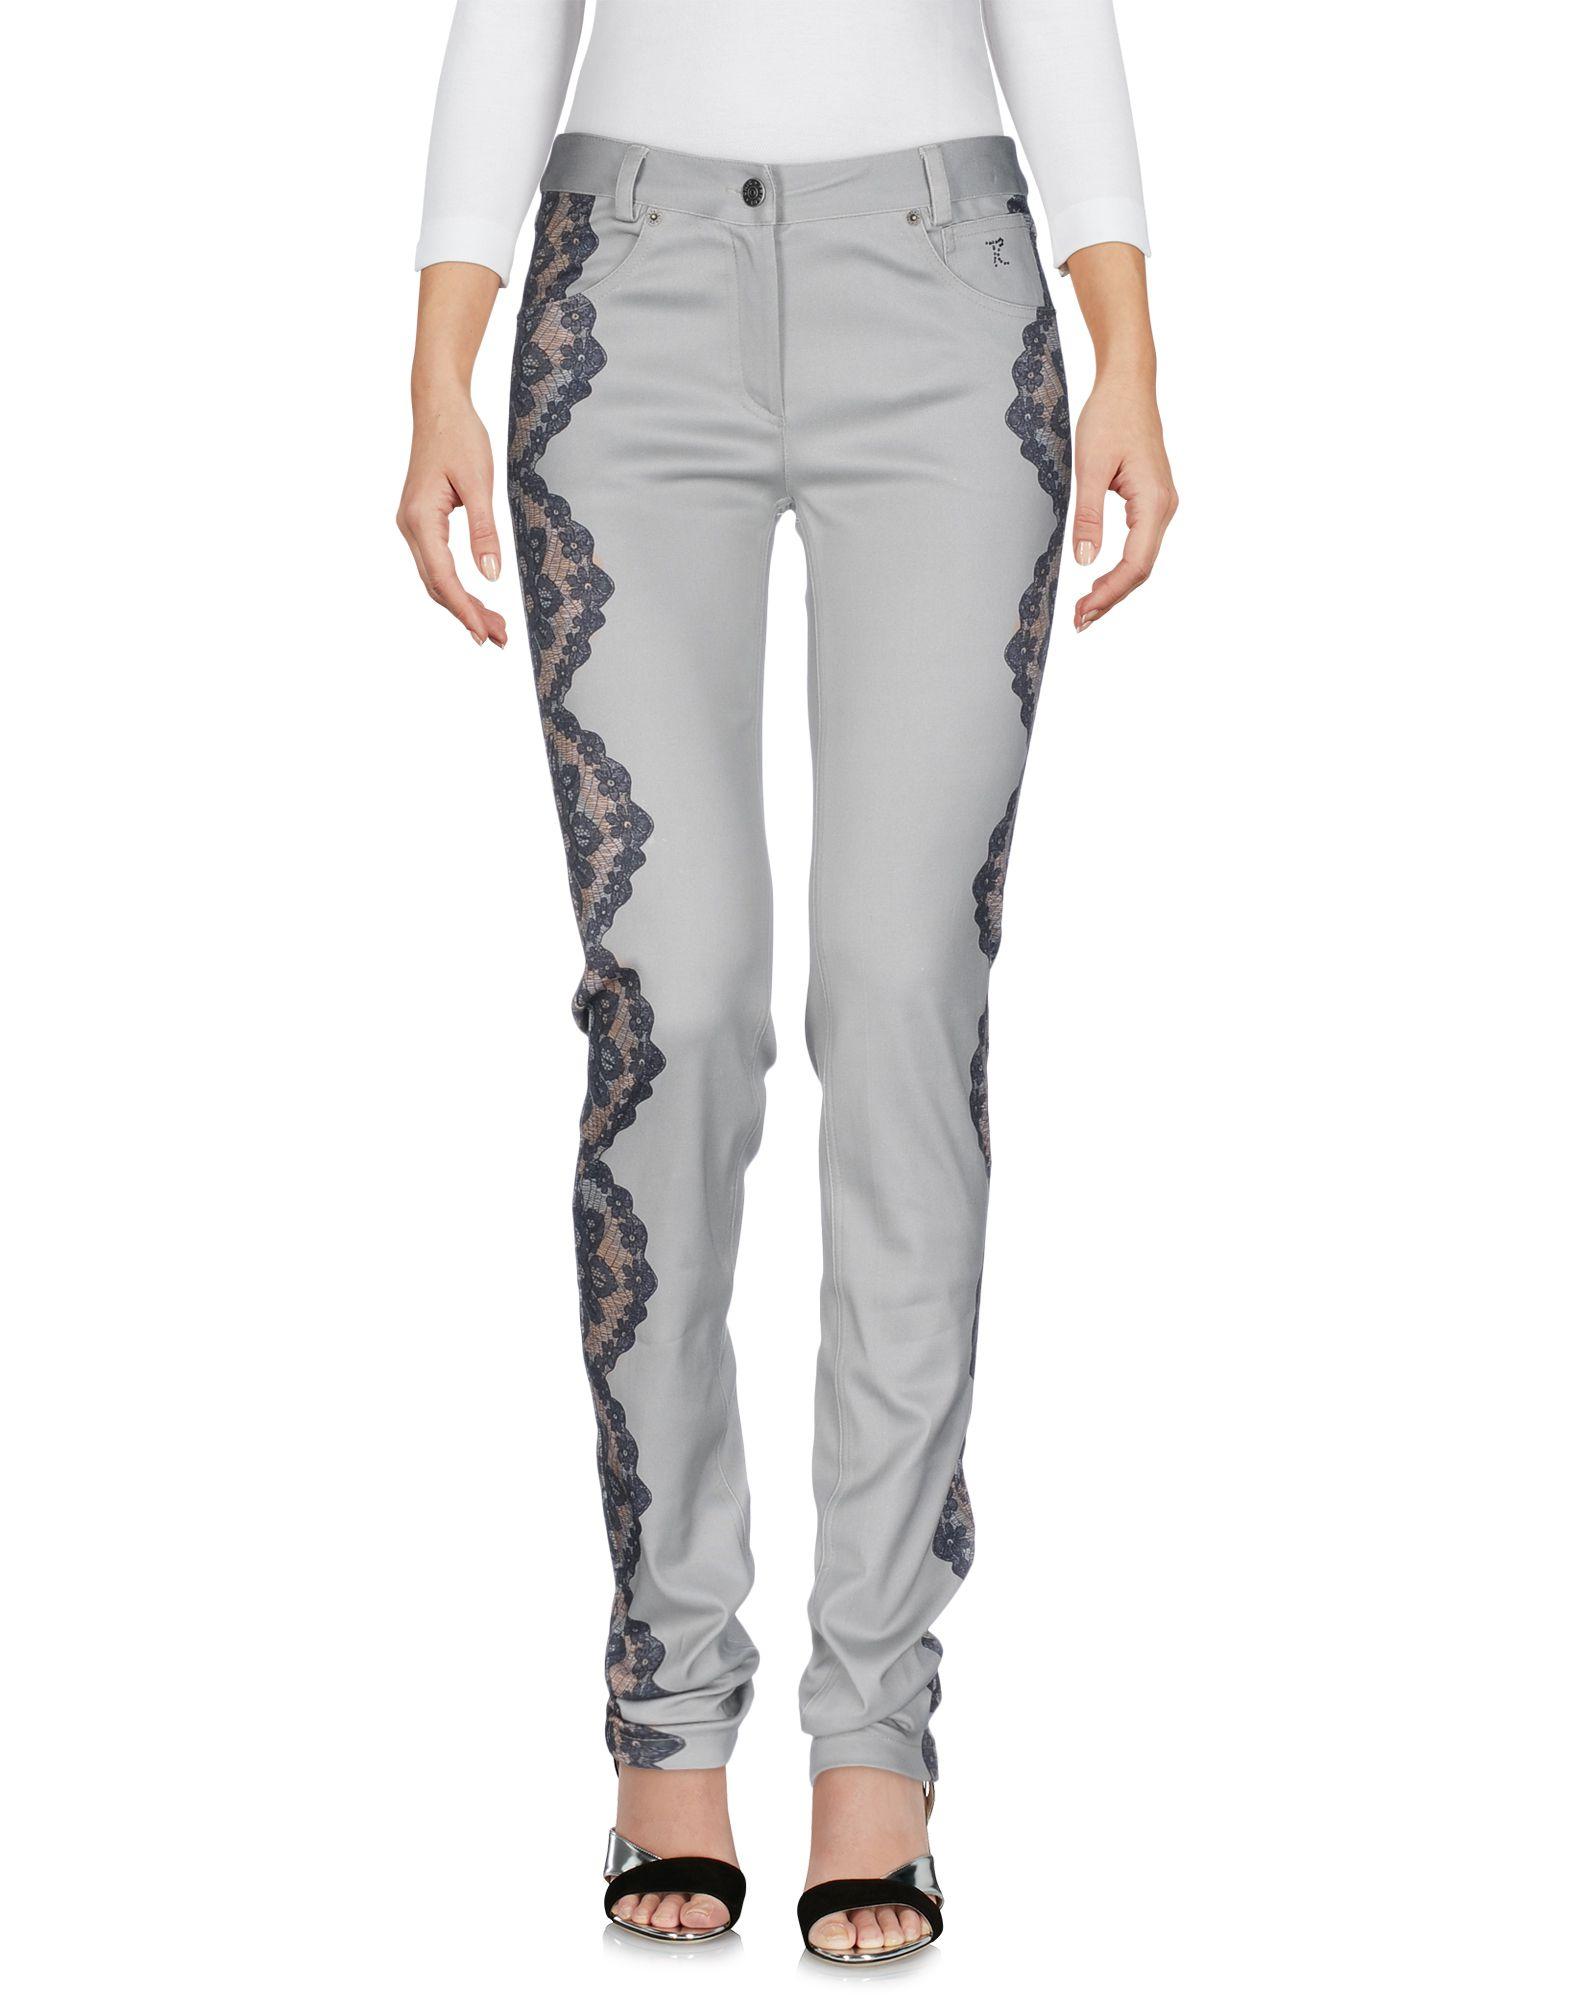 TRICOT CHIC Damen Jeanshose Farbe Grau Größe 3